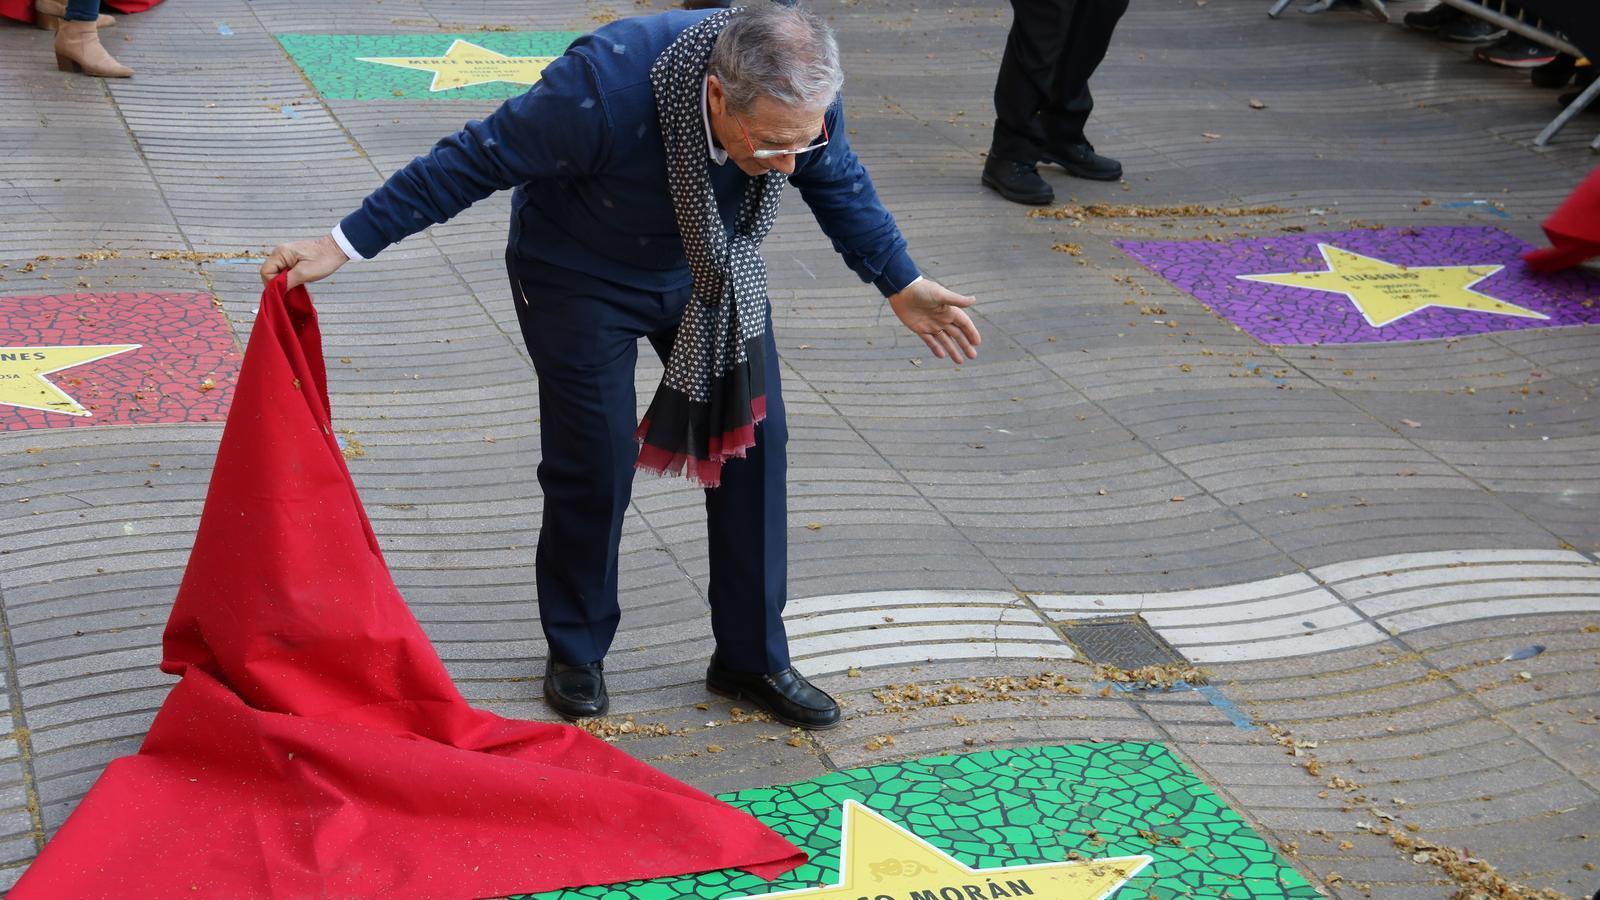 El sector teatral vol un passeig de la fama a la Rambla de Barcelona